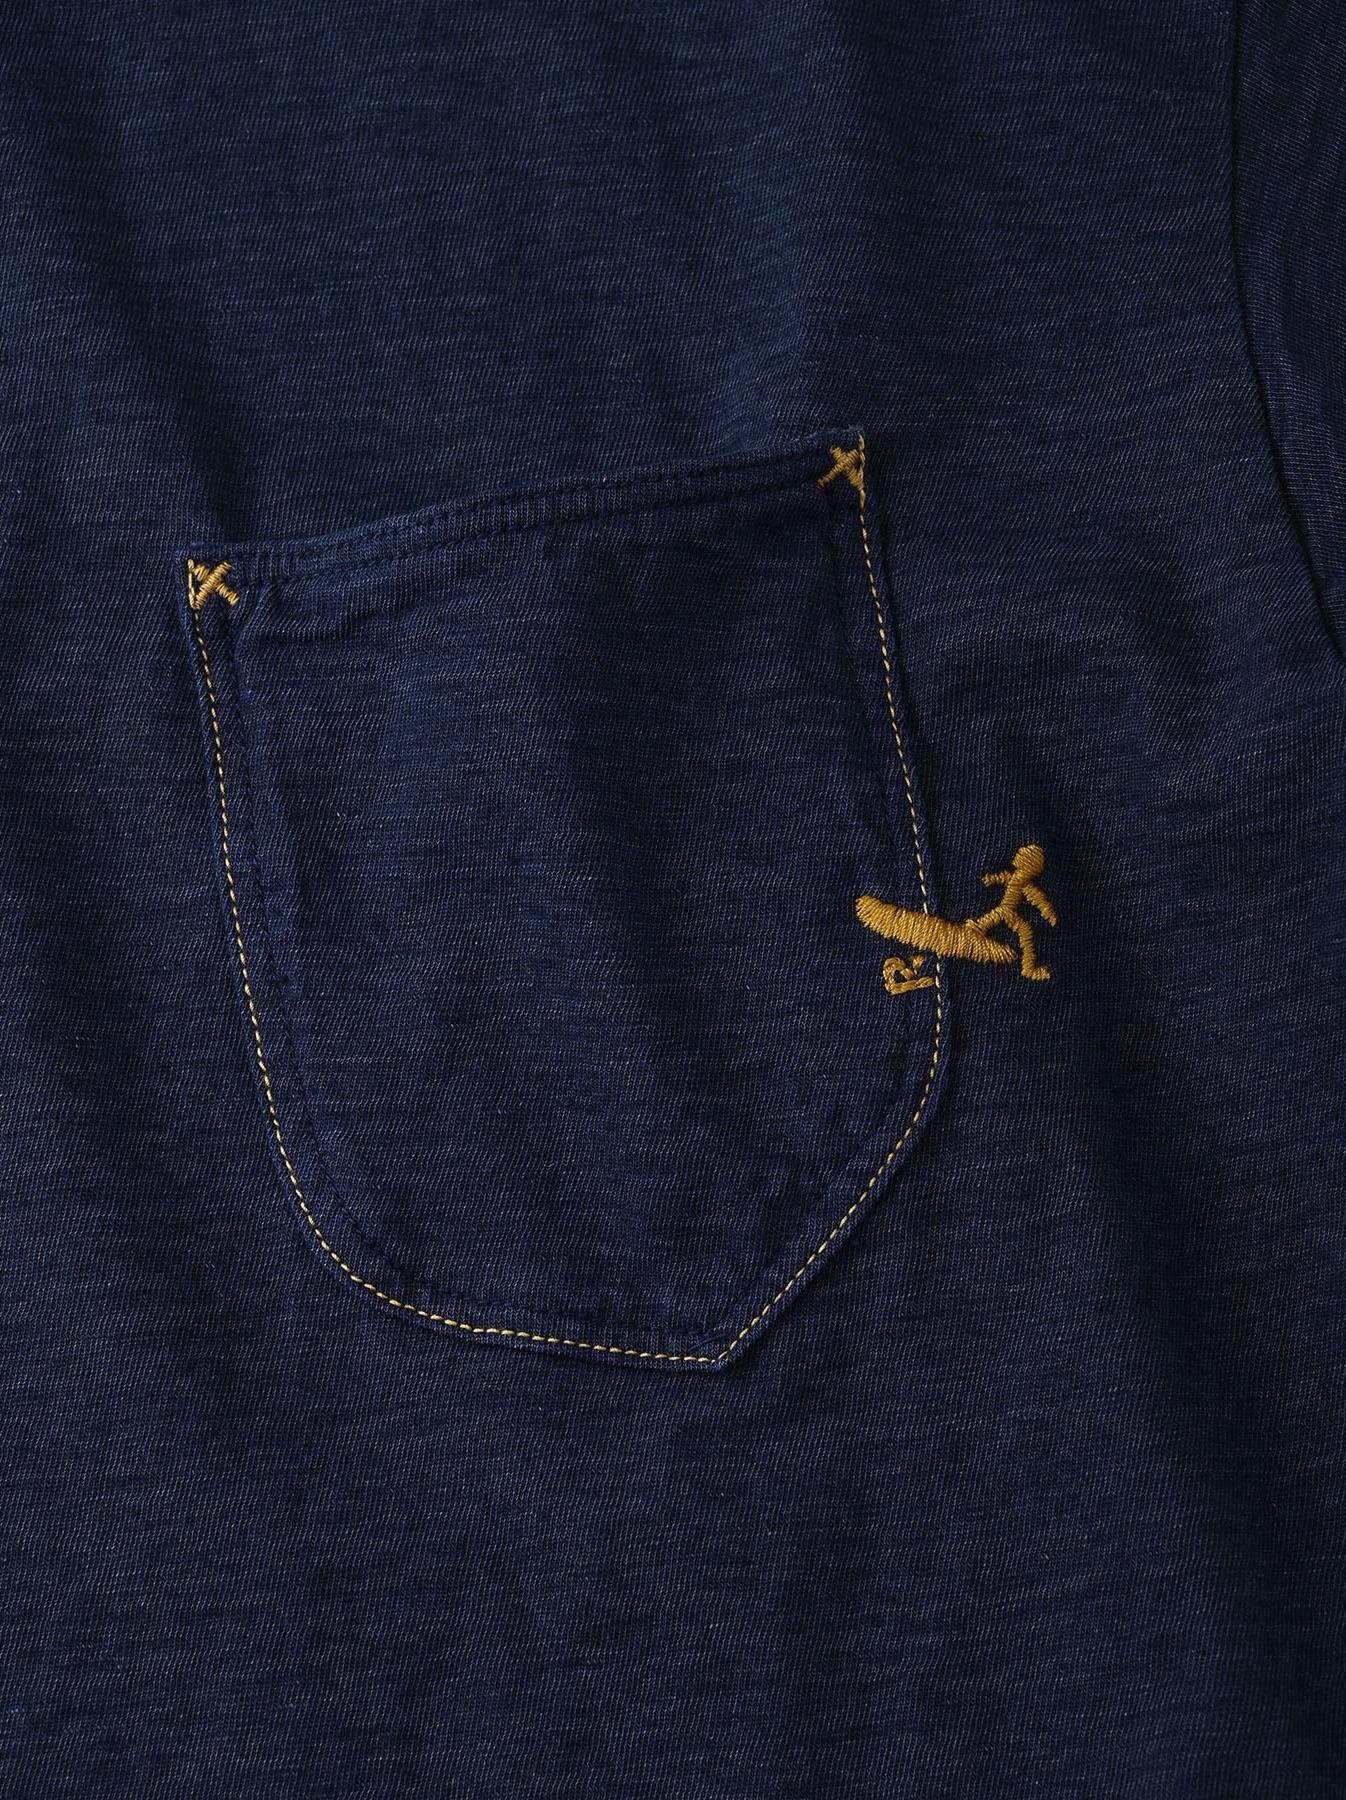 Indigo Hayama-kun Embroidered 908 Ocean T-shirt (0621)-10